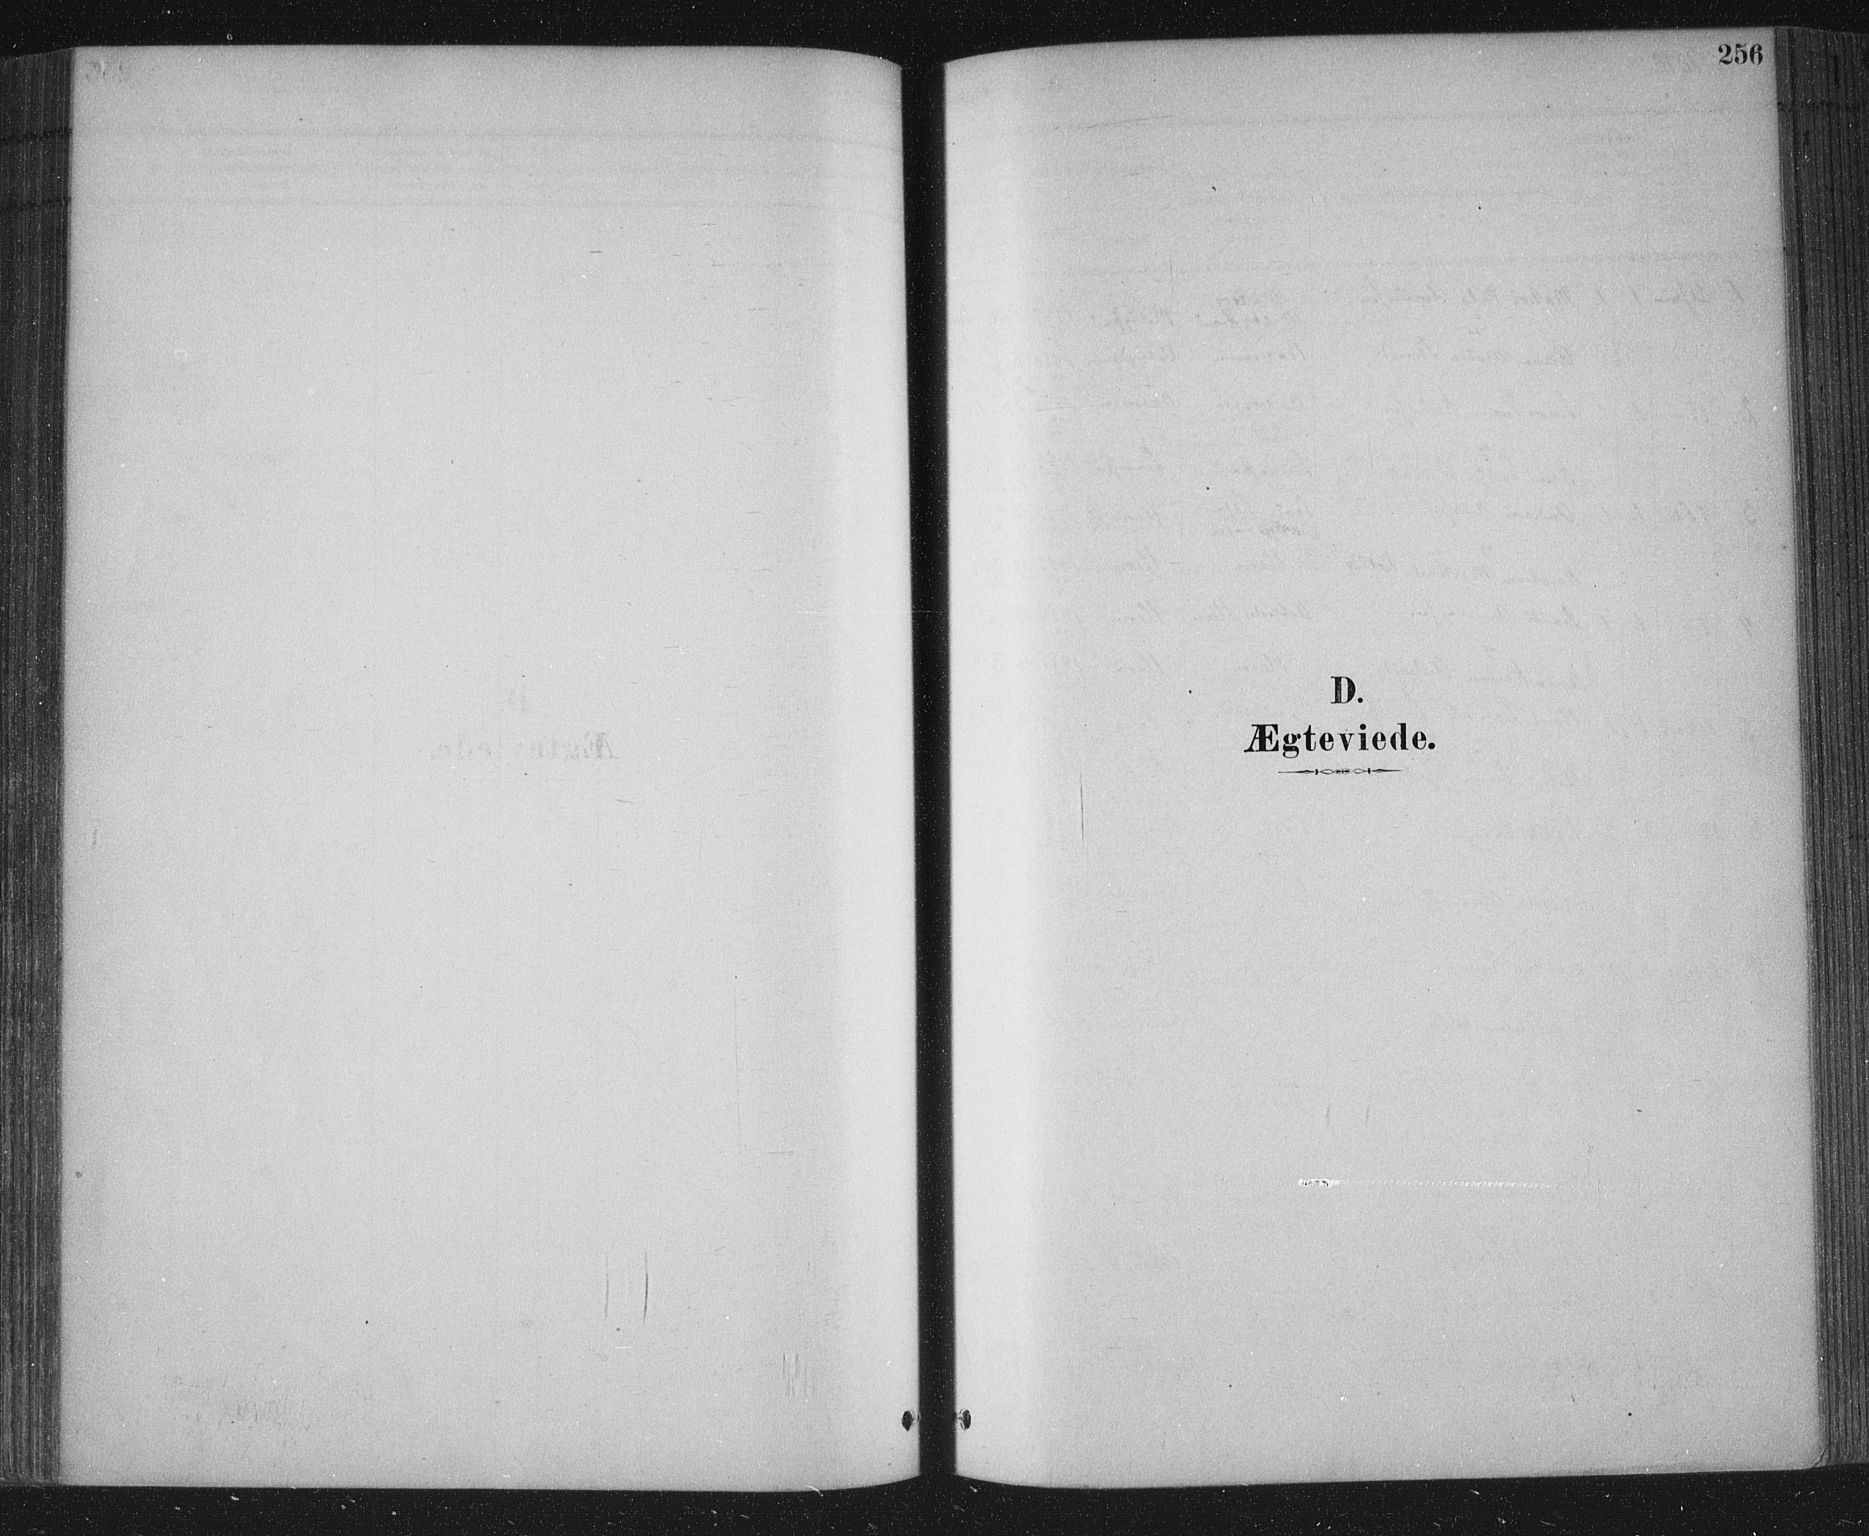 SAKO, Bamble kirkebøker, F/Fa/L0007: Ministerialbok nr. I 7, 1878-1888, s. 256